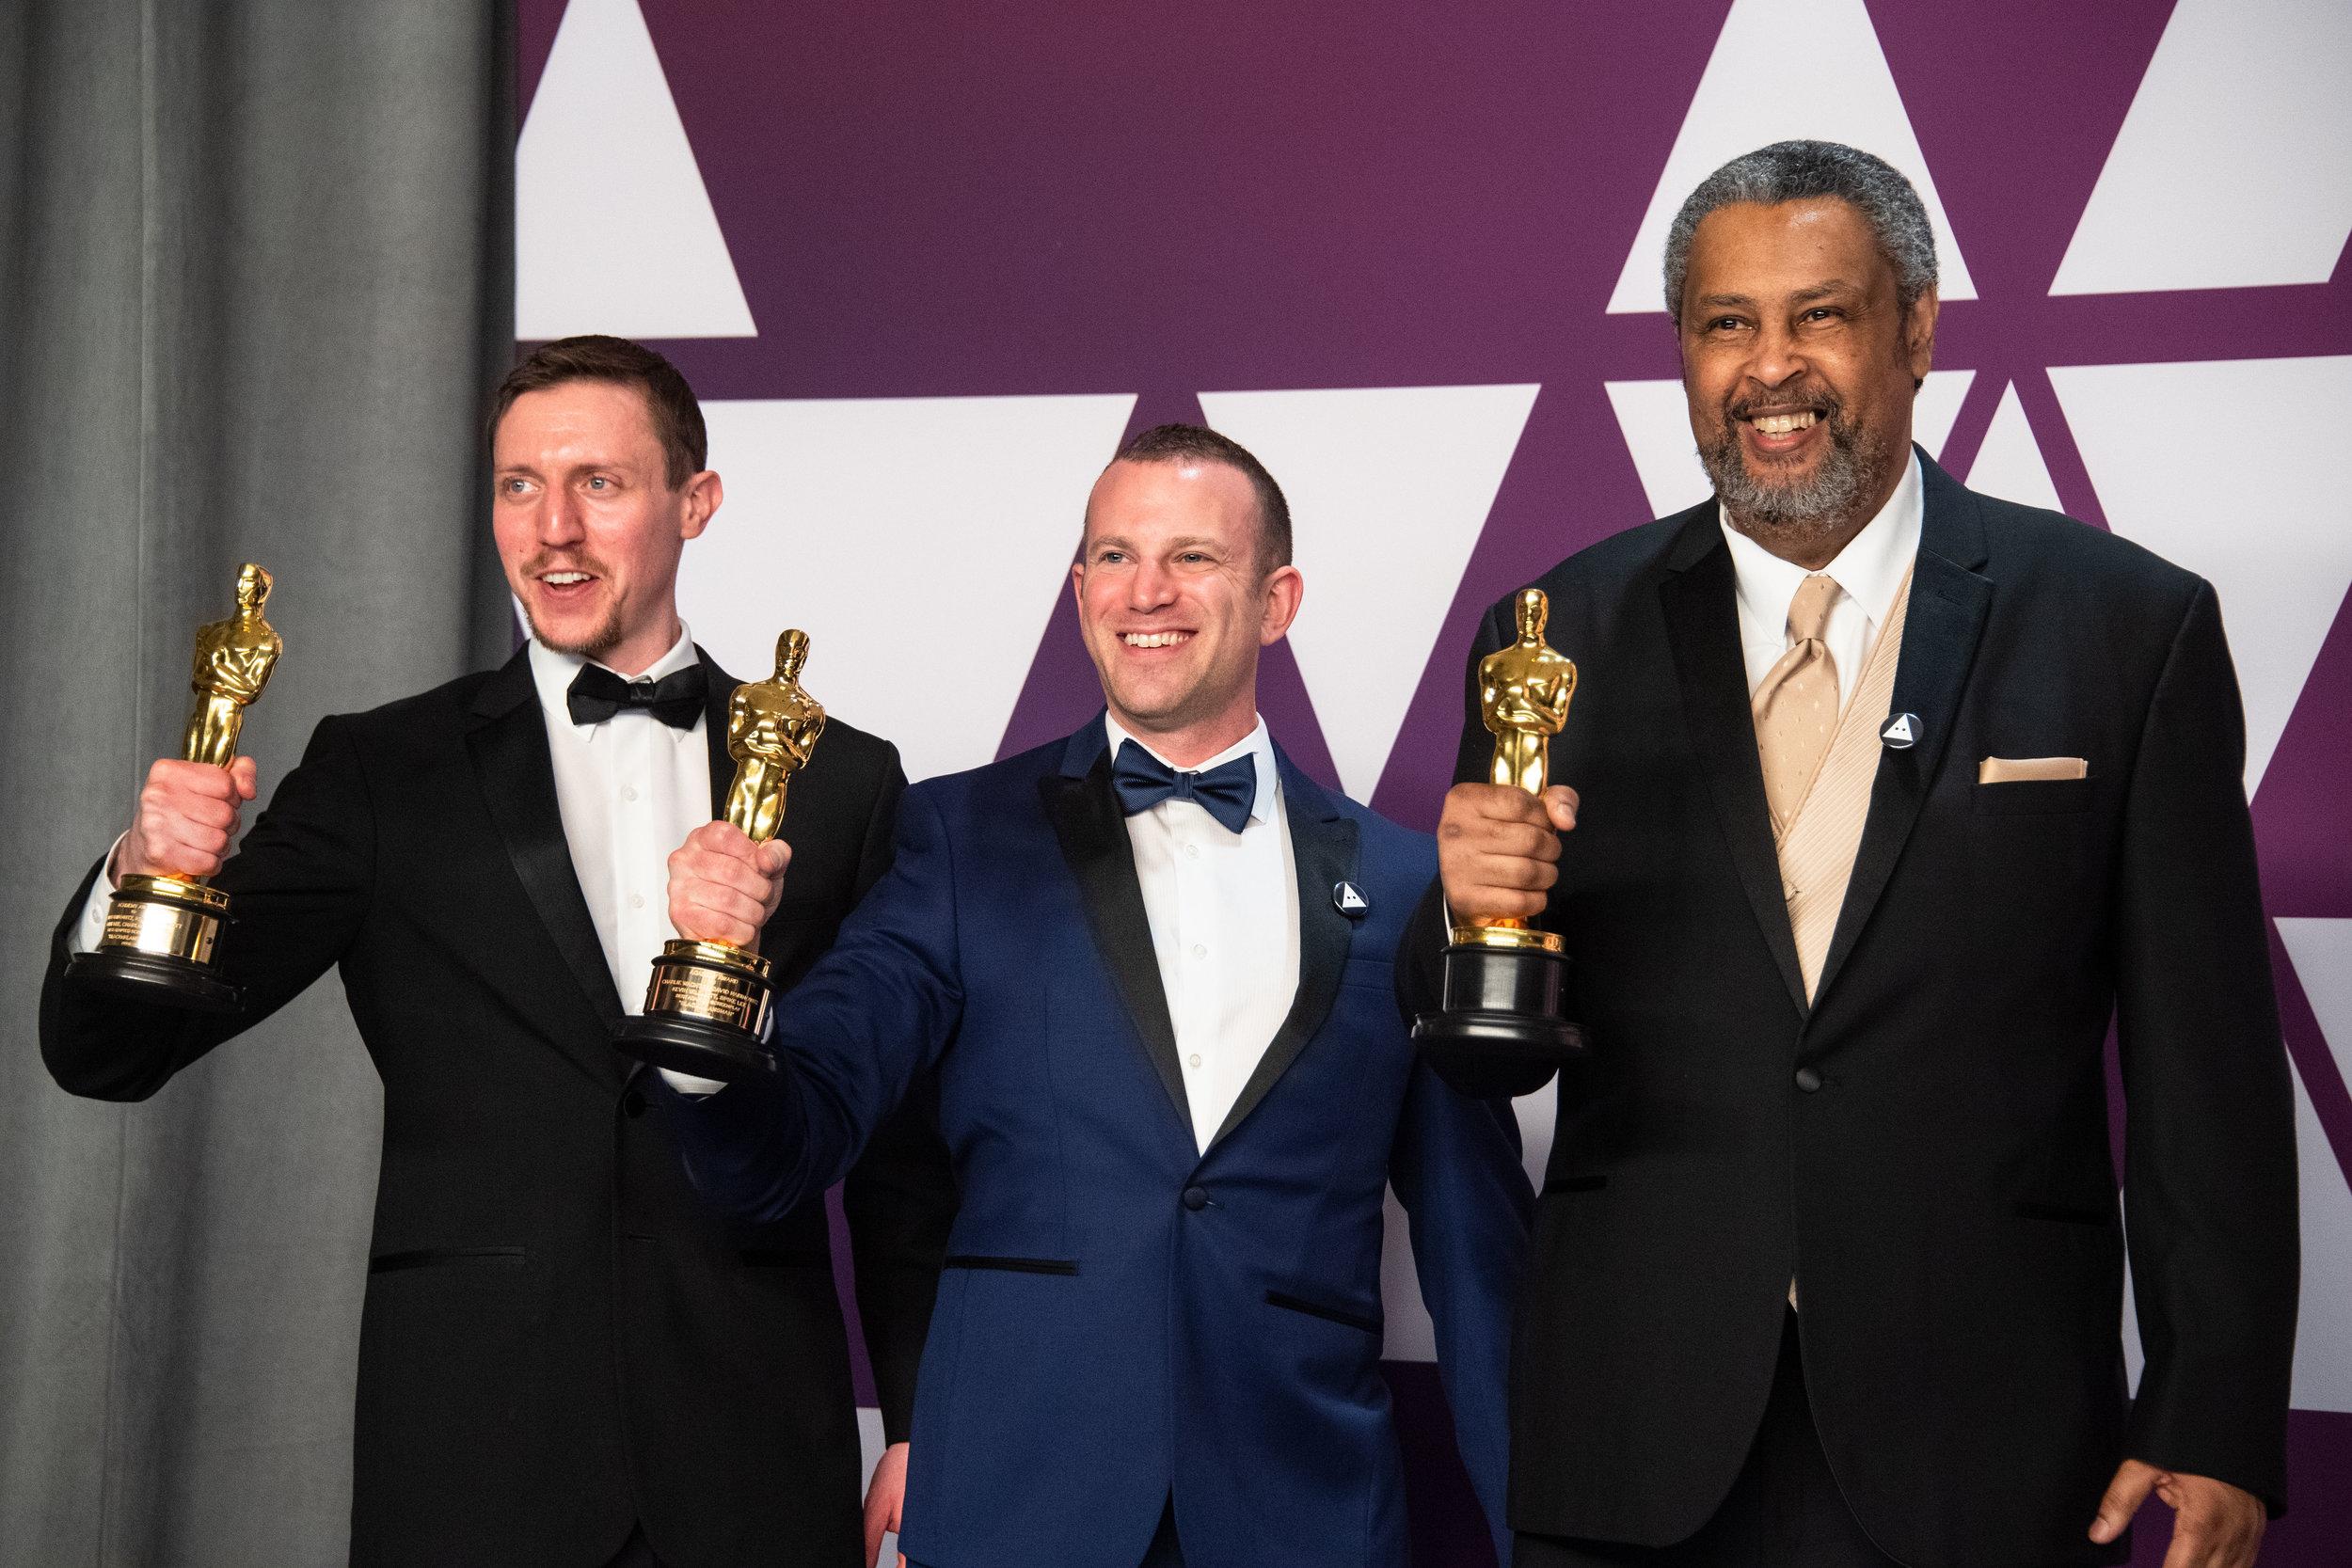 Left to right: Rabinowitz, Wachtel and Willmott with their awards.  Photo courtesy of 91st Oscars® Press Kits.